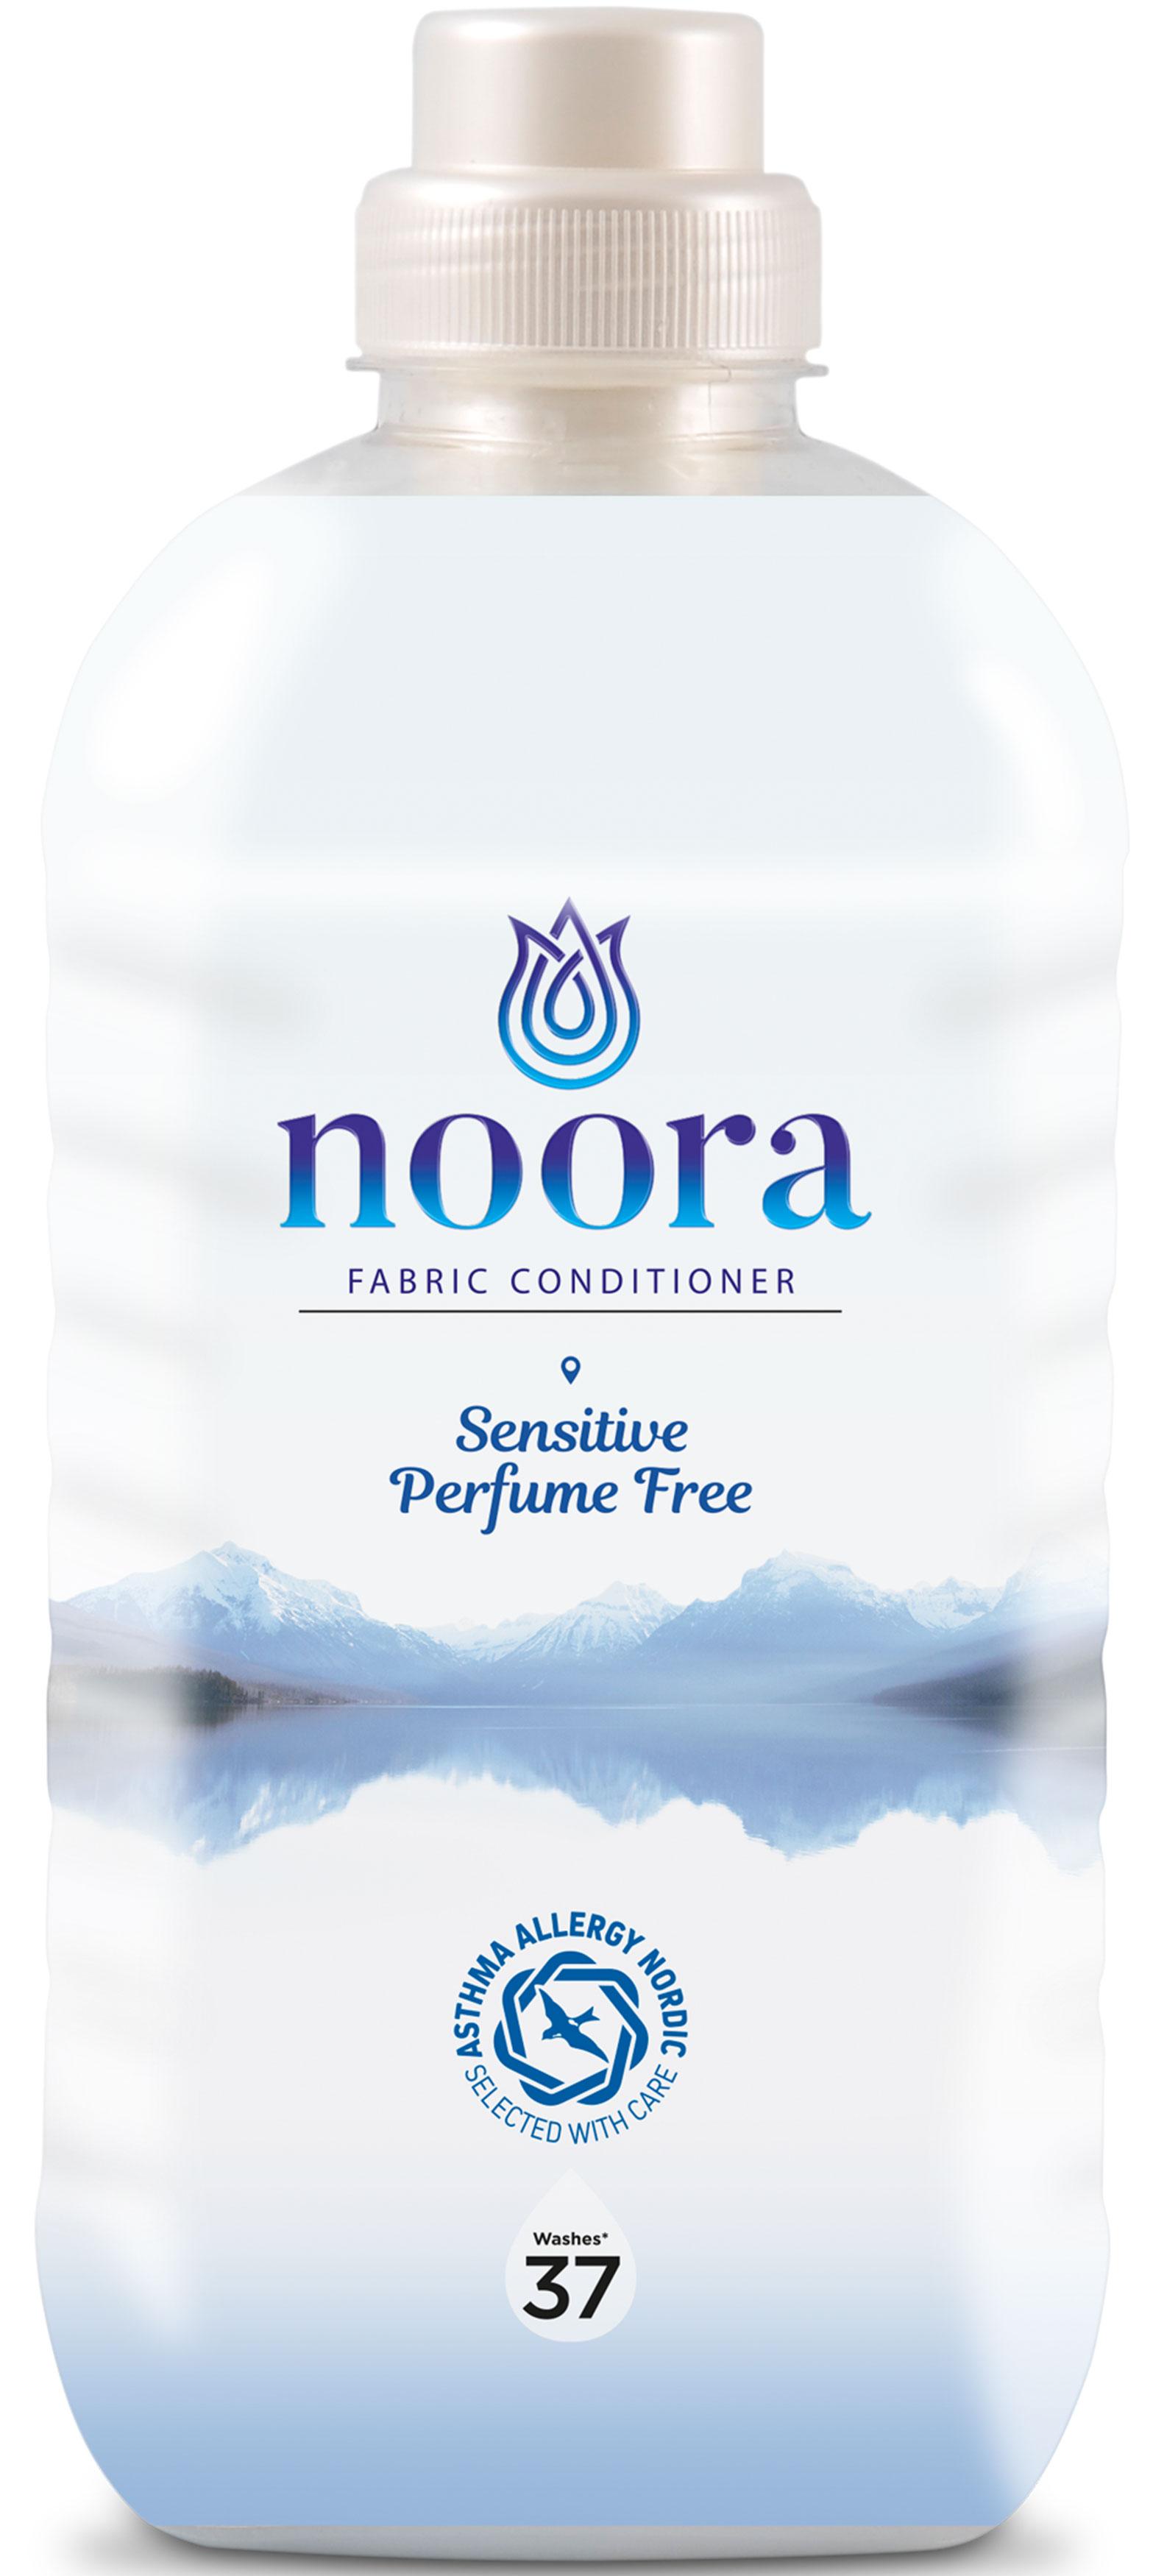 noora_sensitive